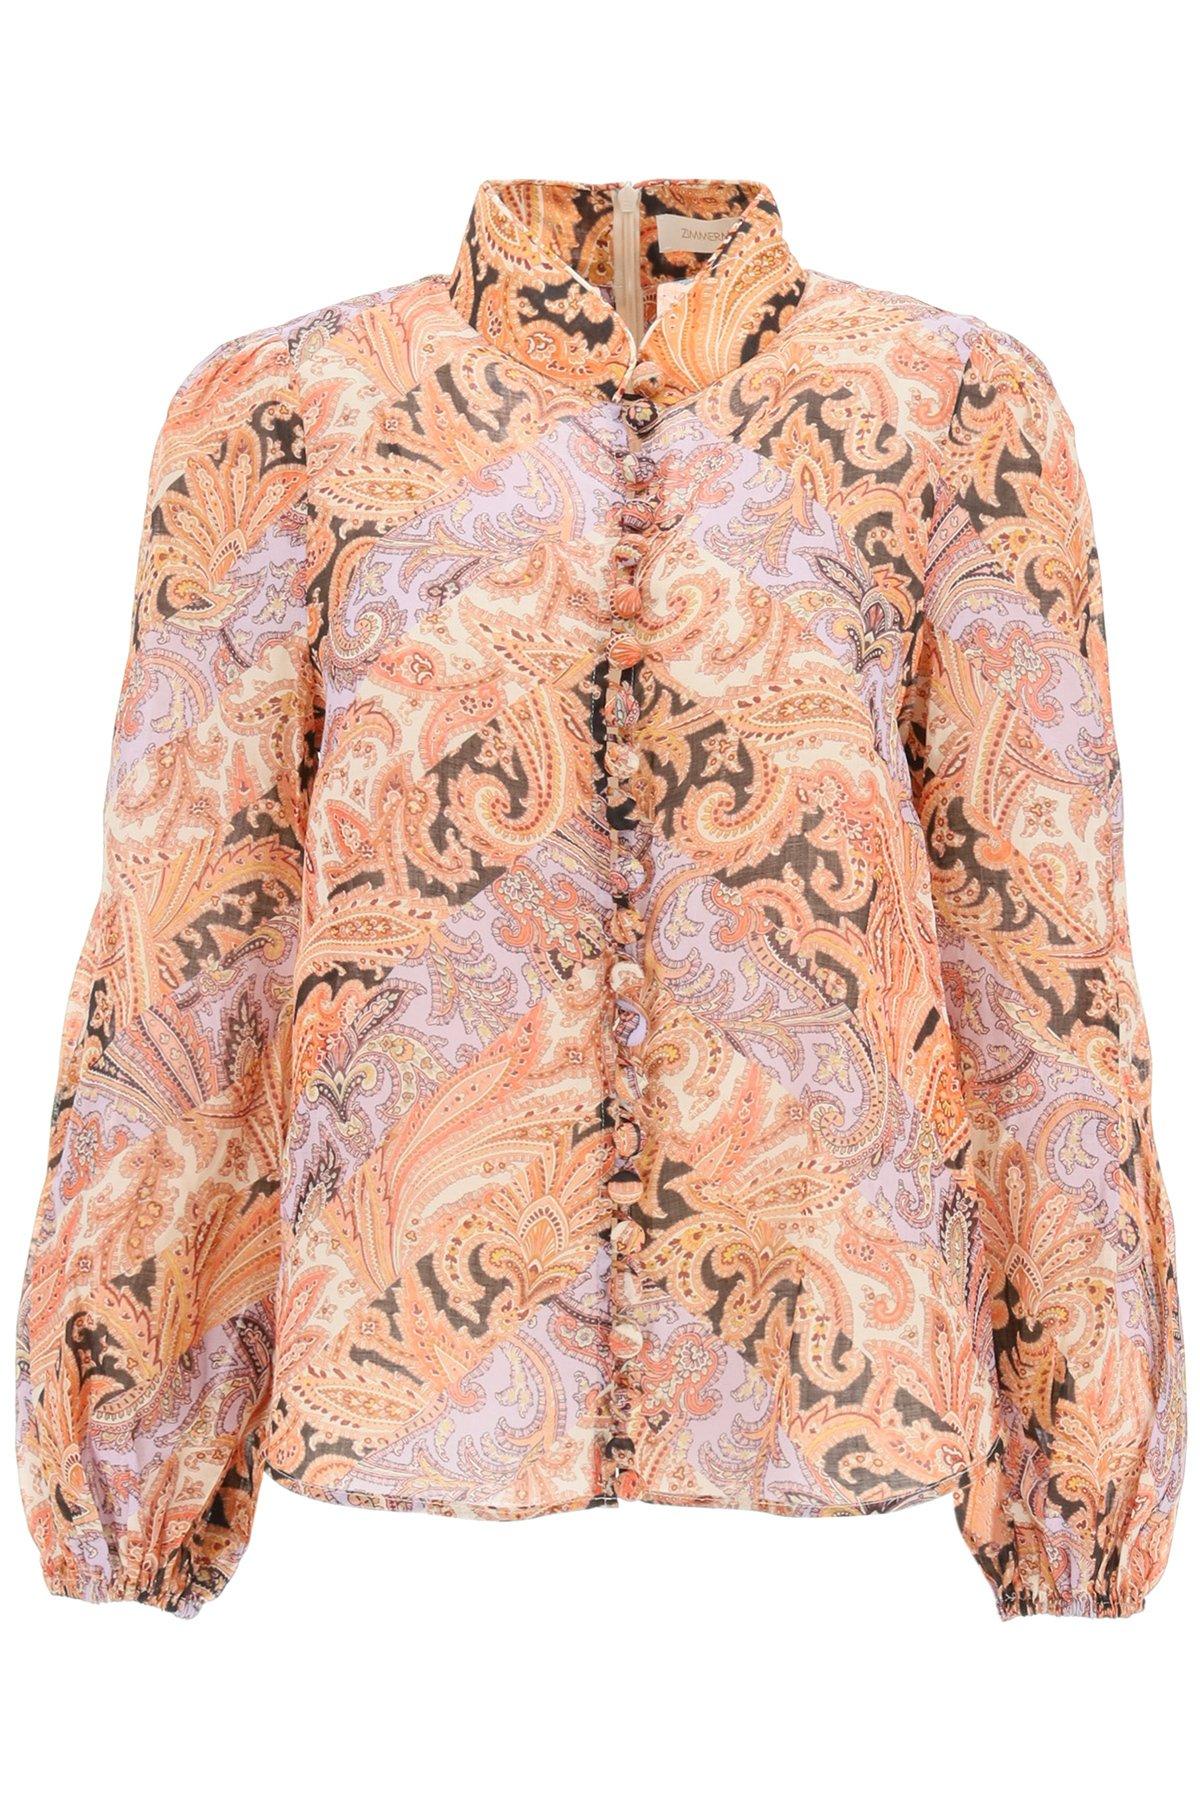 Zimmermann camicia in ramie botanica chevron paisley